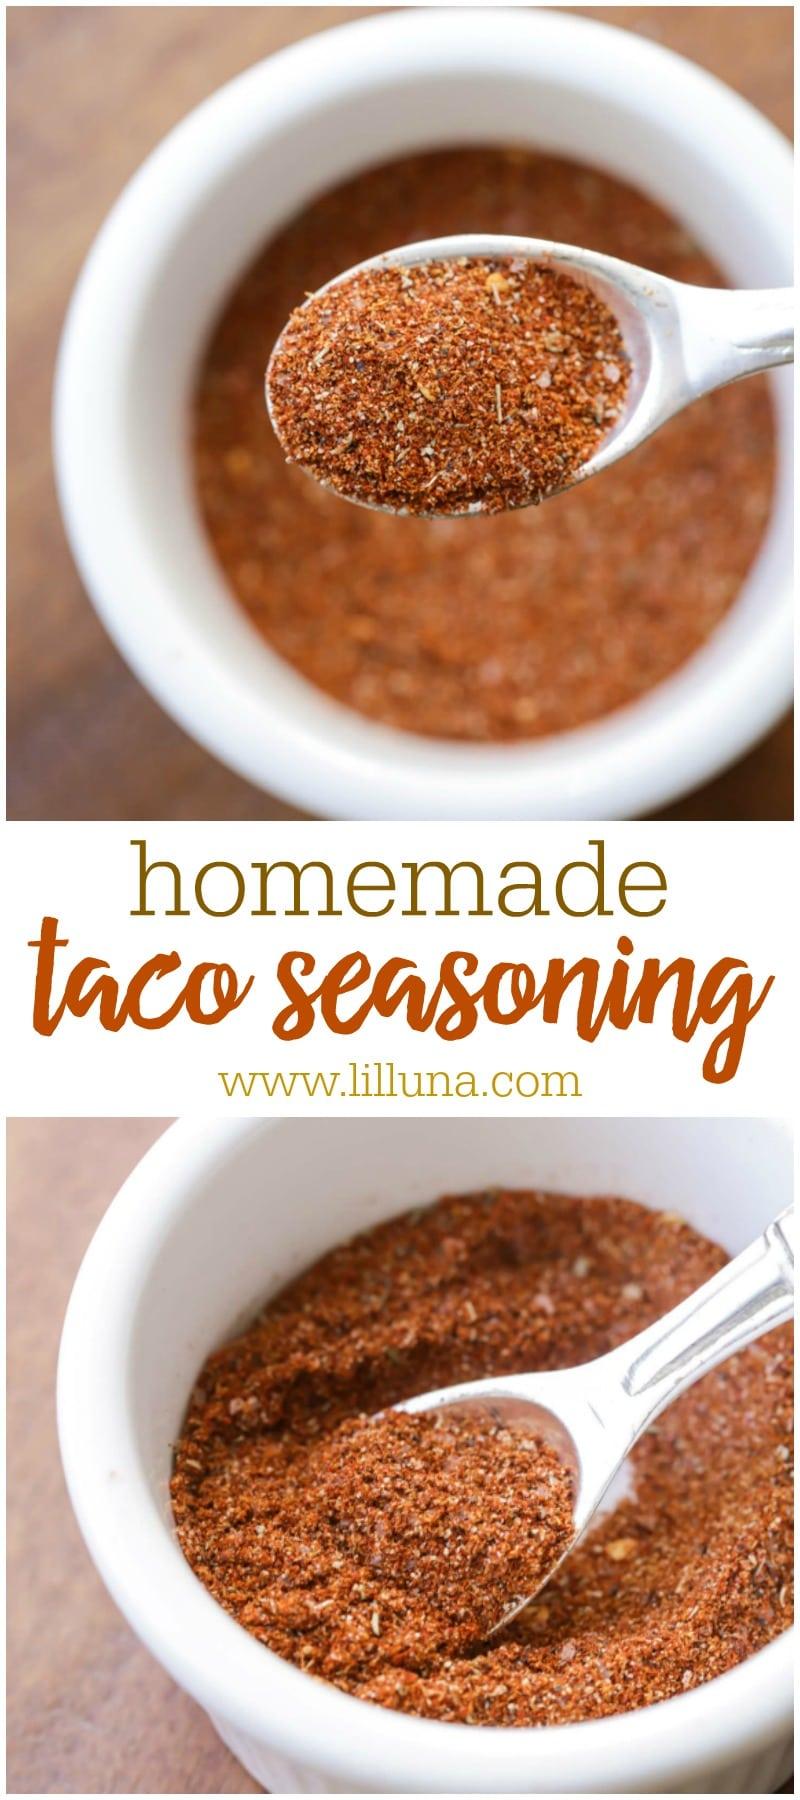 BEST Homemade Taco Seasoning recipe